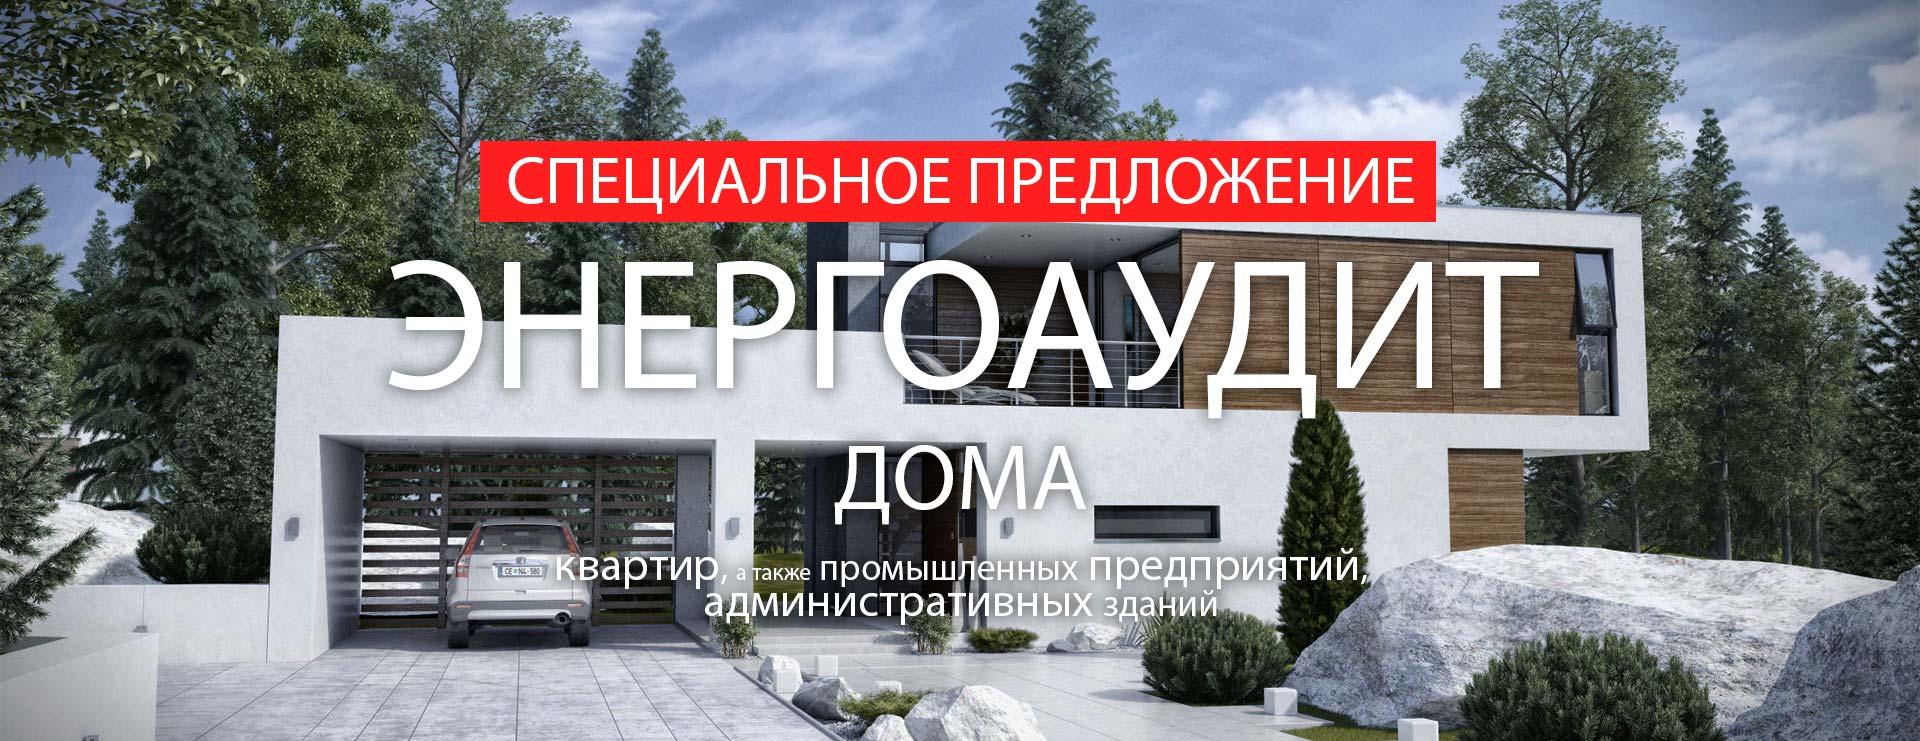 house_bg